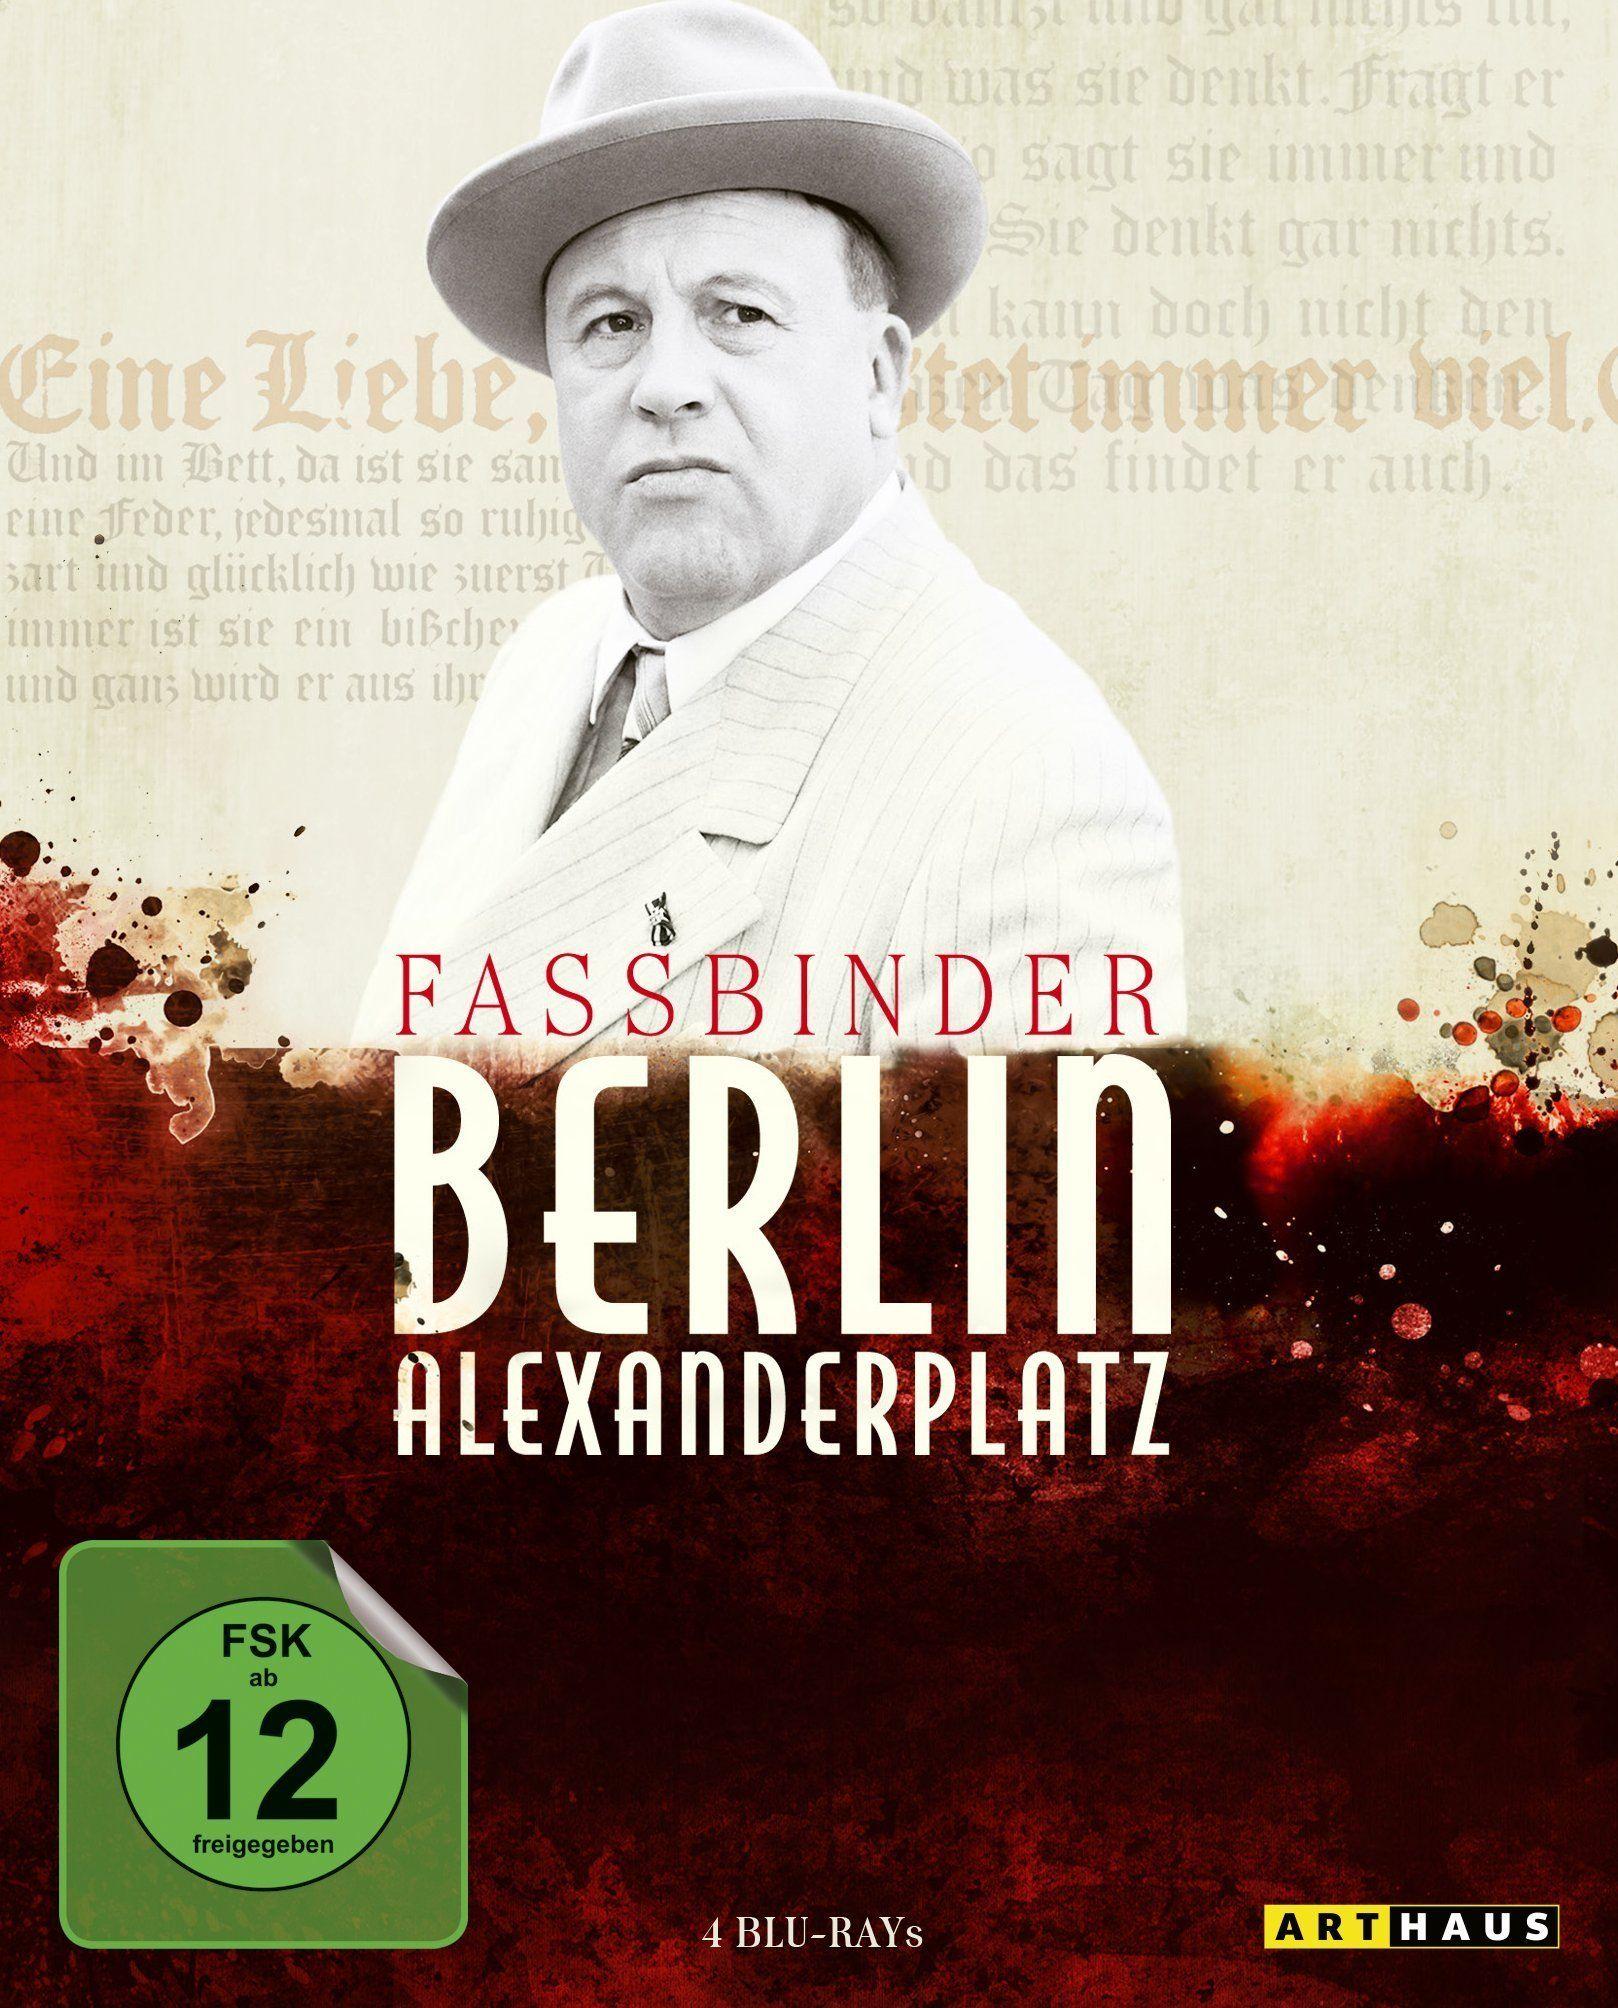 Rainer Werner Fassbinder Filmmaker En 2020 Cineastas